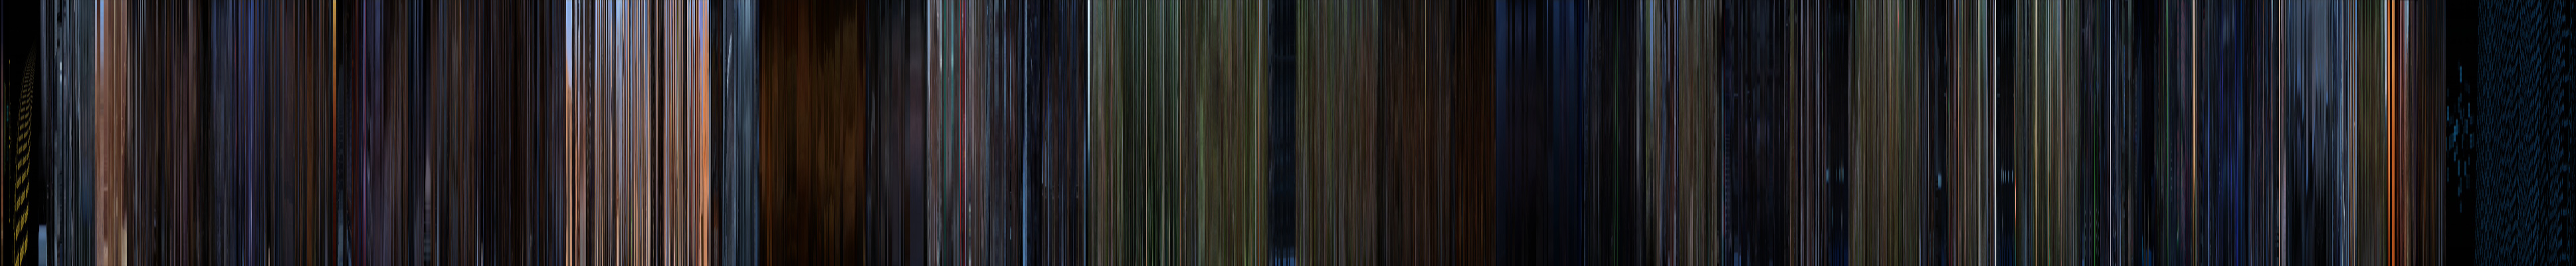 Video Barcode Script - Codebox Software